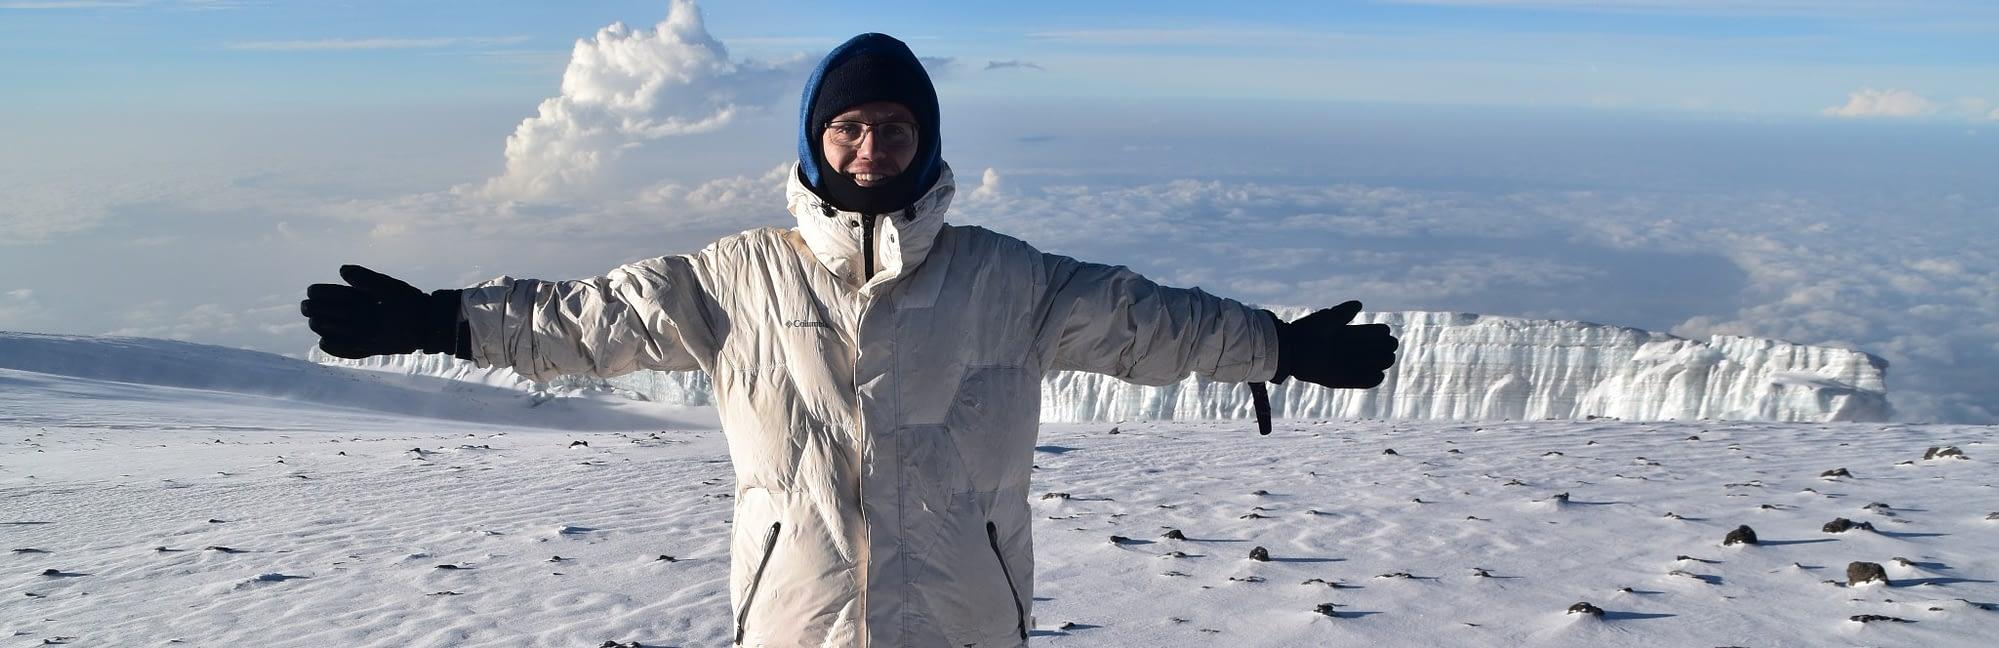 Enjoying the summit of Kilimanjaro